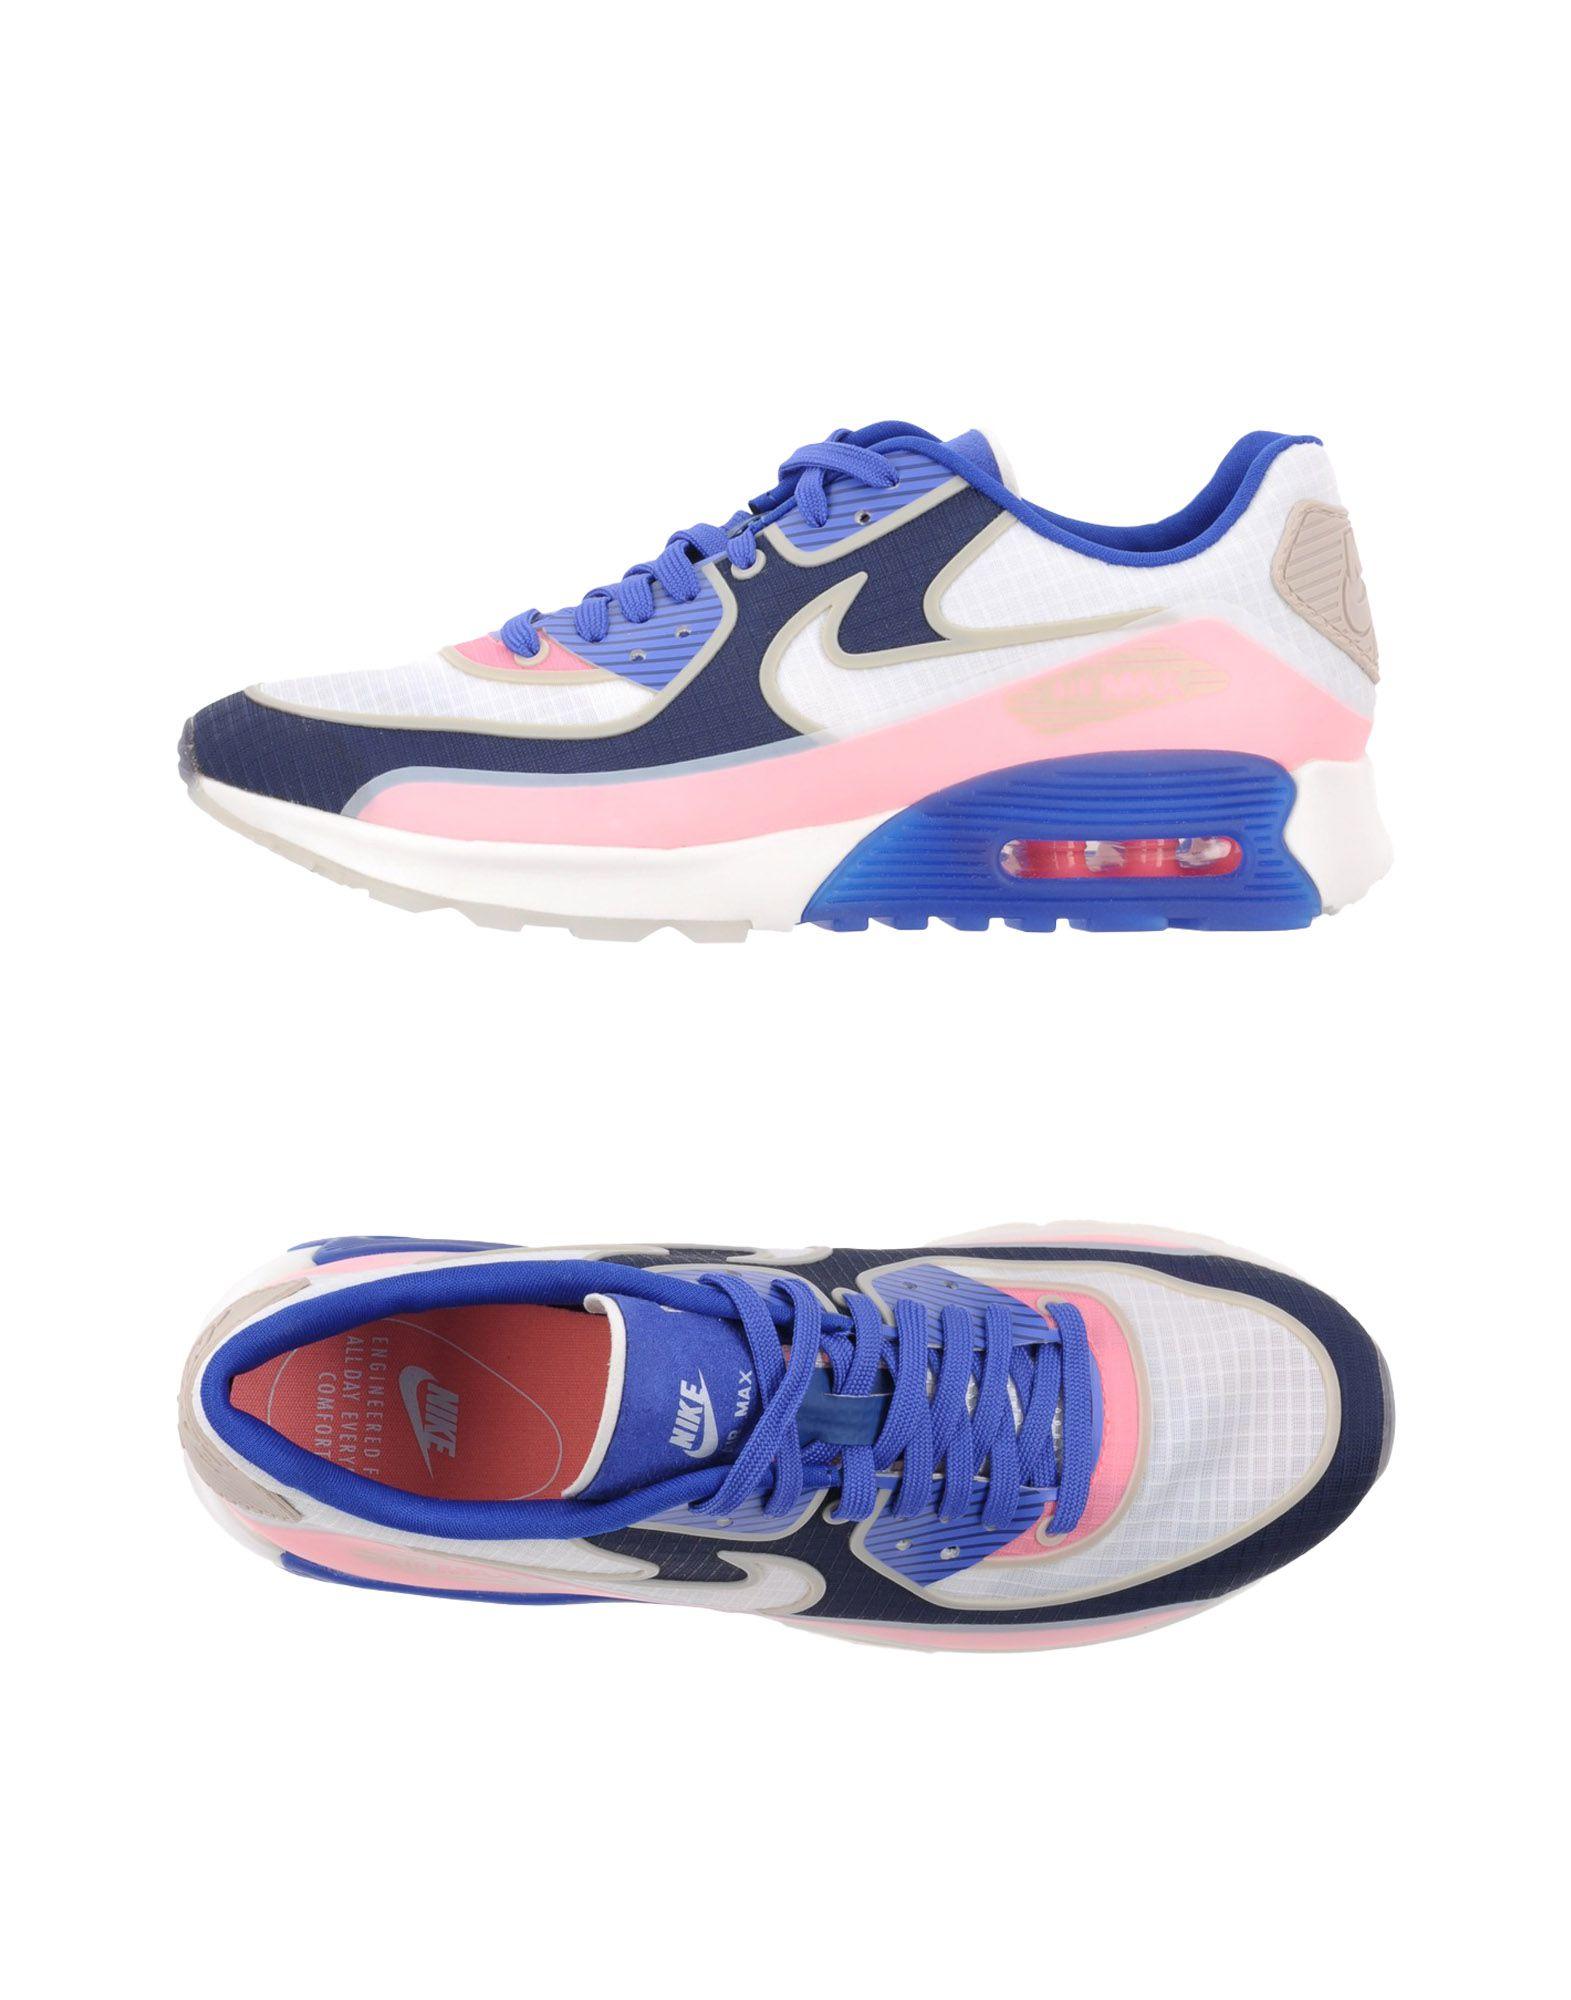 Nike beliebte Sneakers Damen  11359360AF Gute Qualität beliebte Nike Schuhe 4513f8